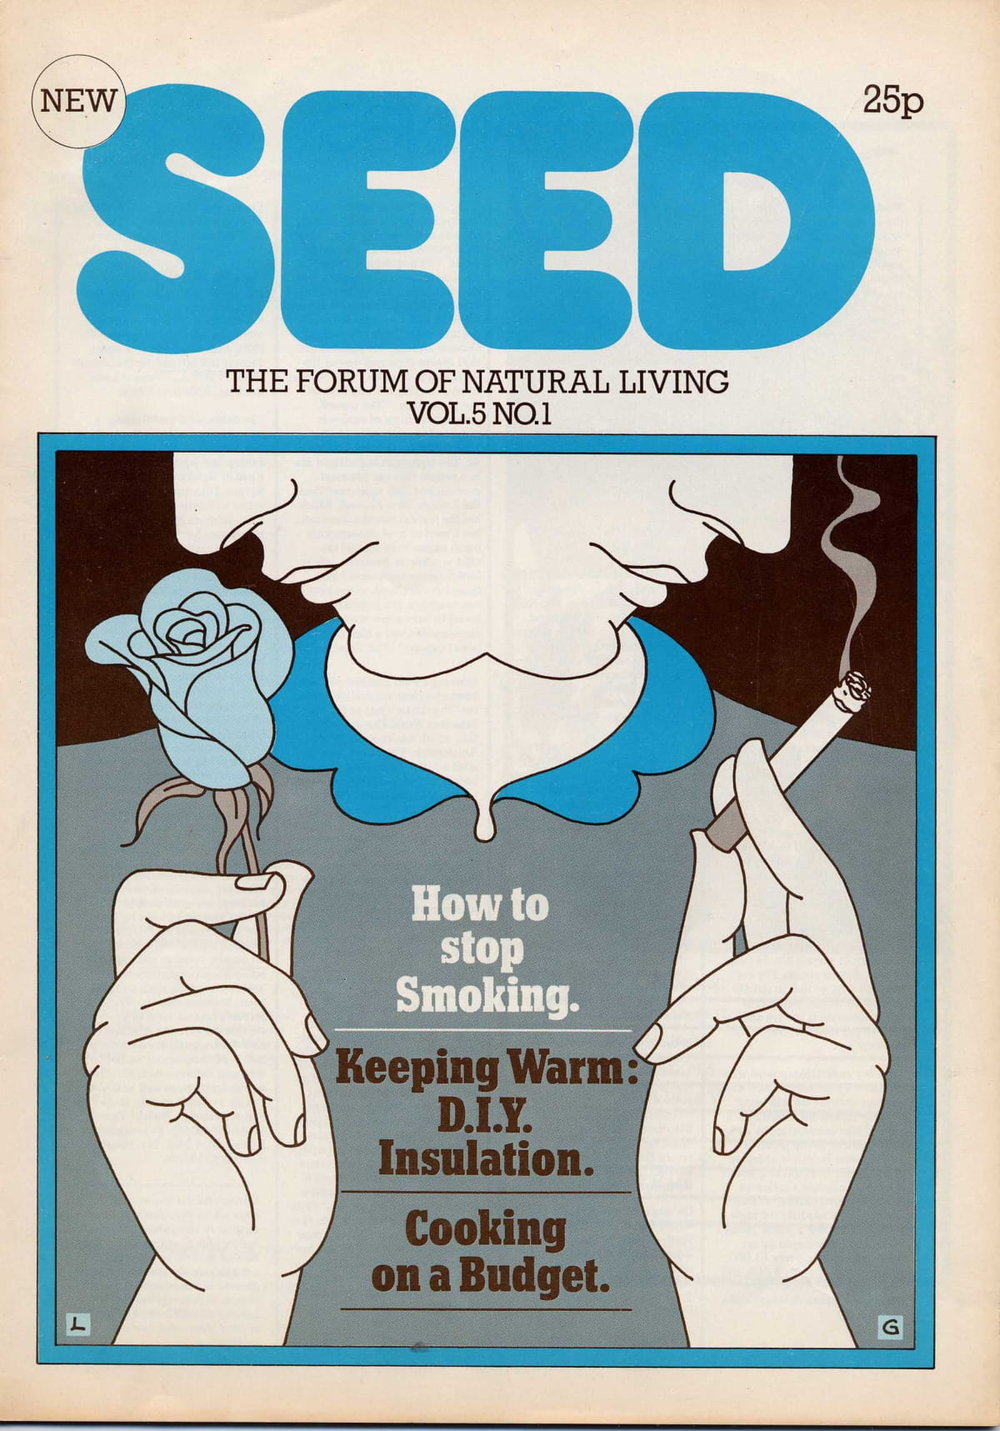 seed-v5-n1-jan1976-01.jpg